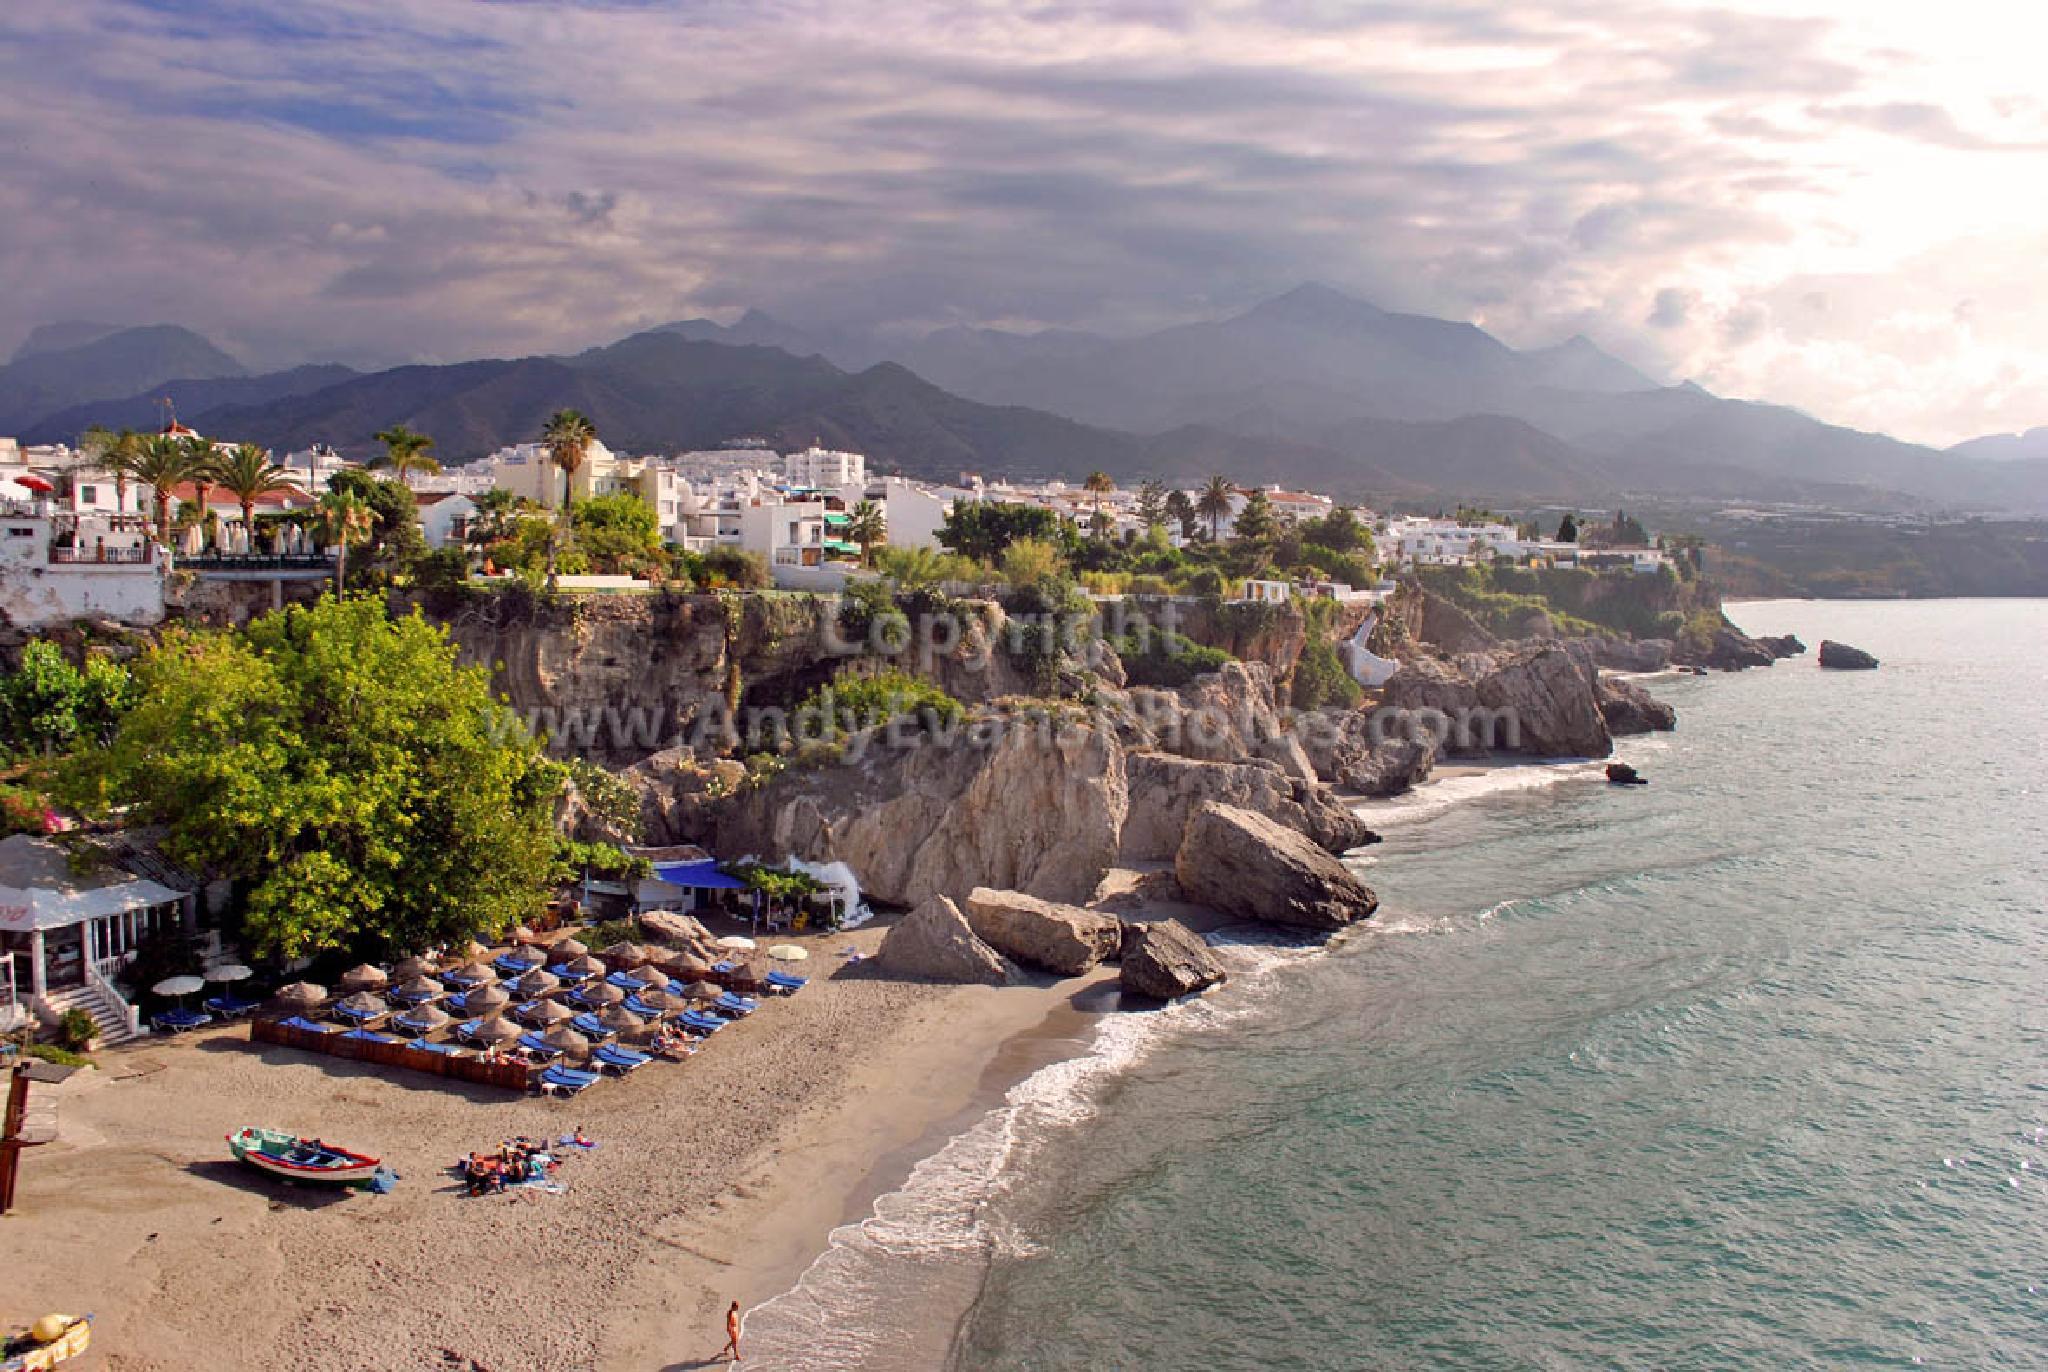 Playa Calahonda, Nerja, Andalusia, Spain by AndyEvans